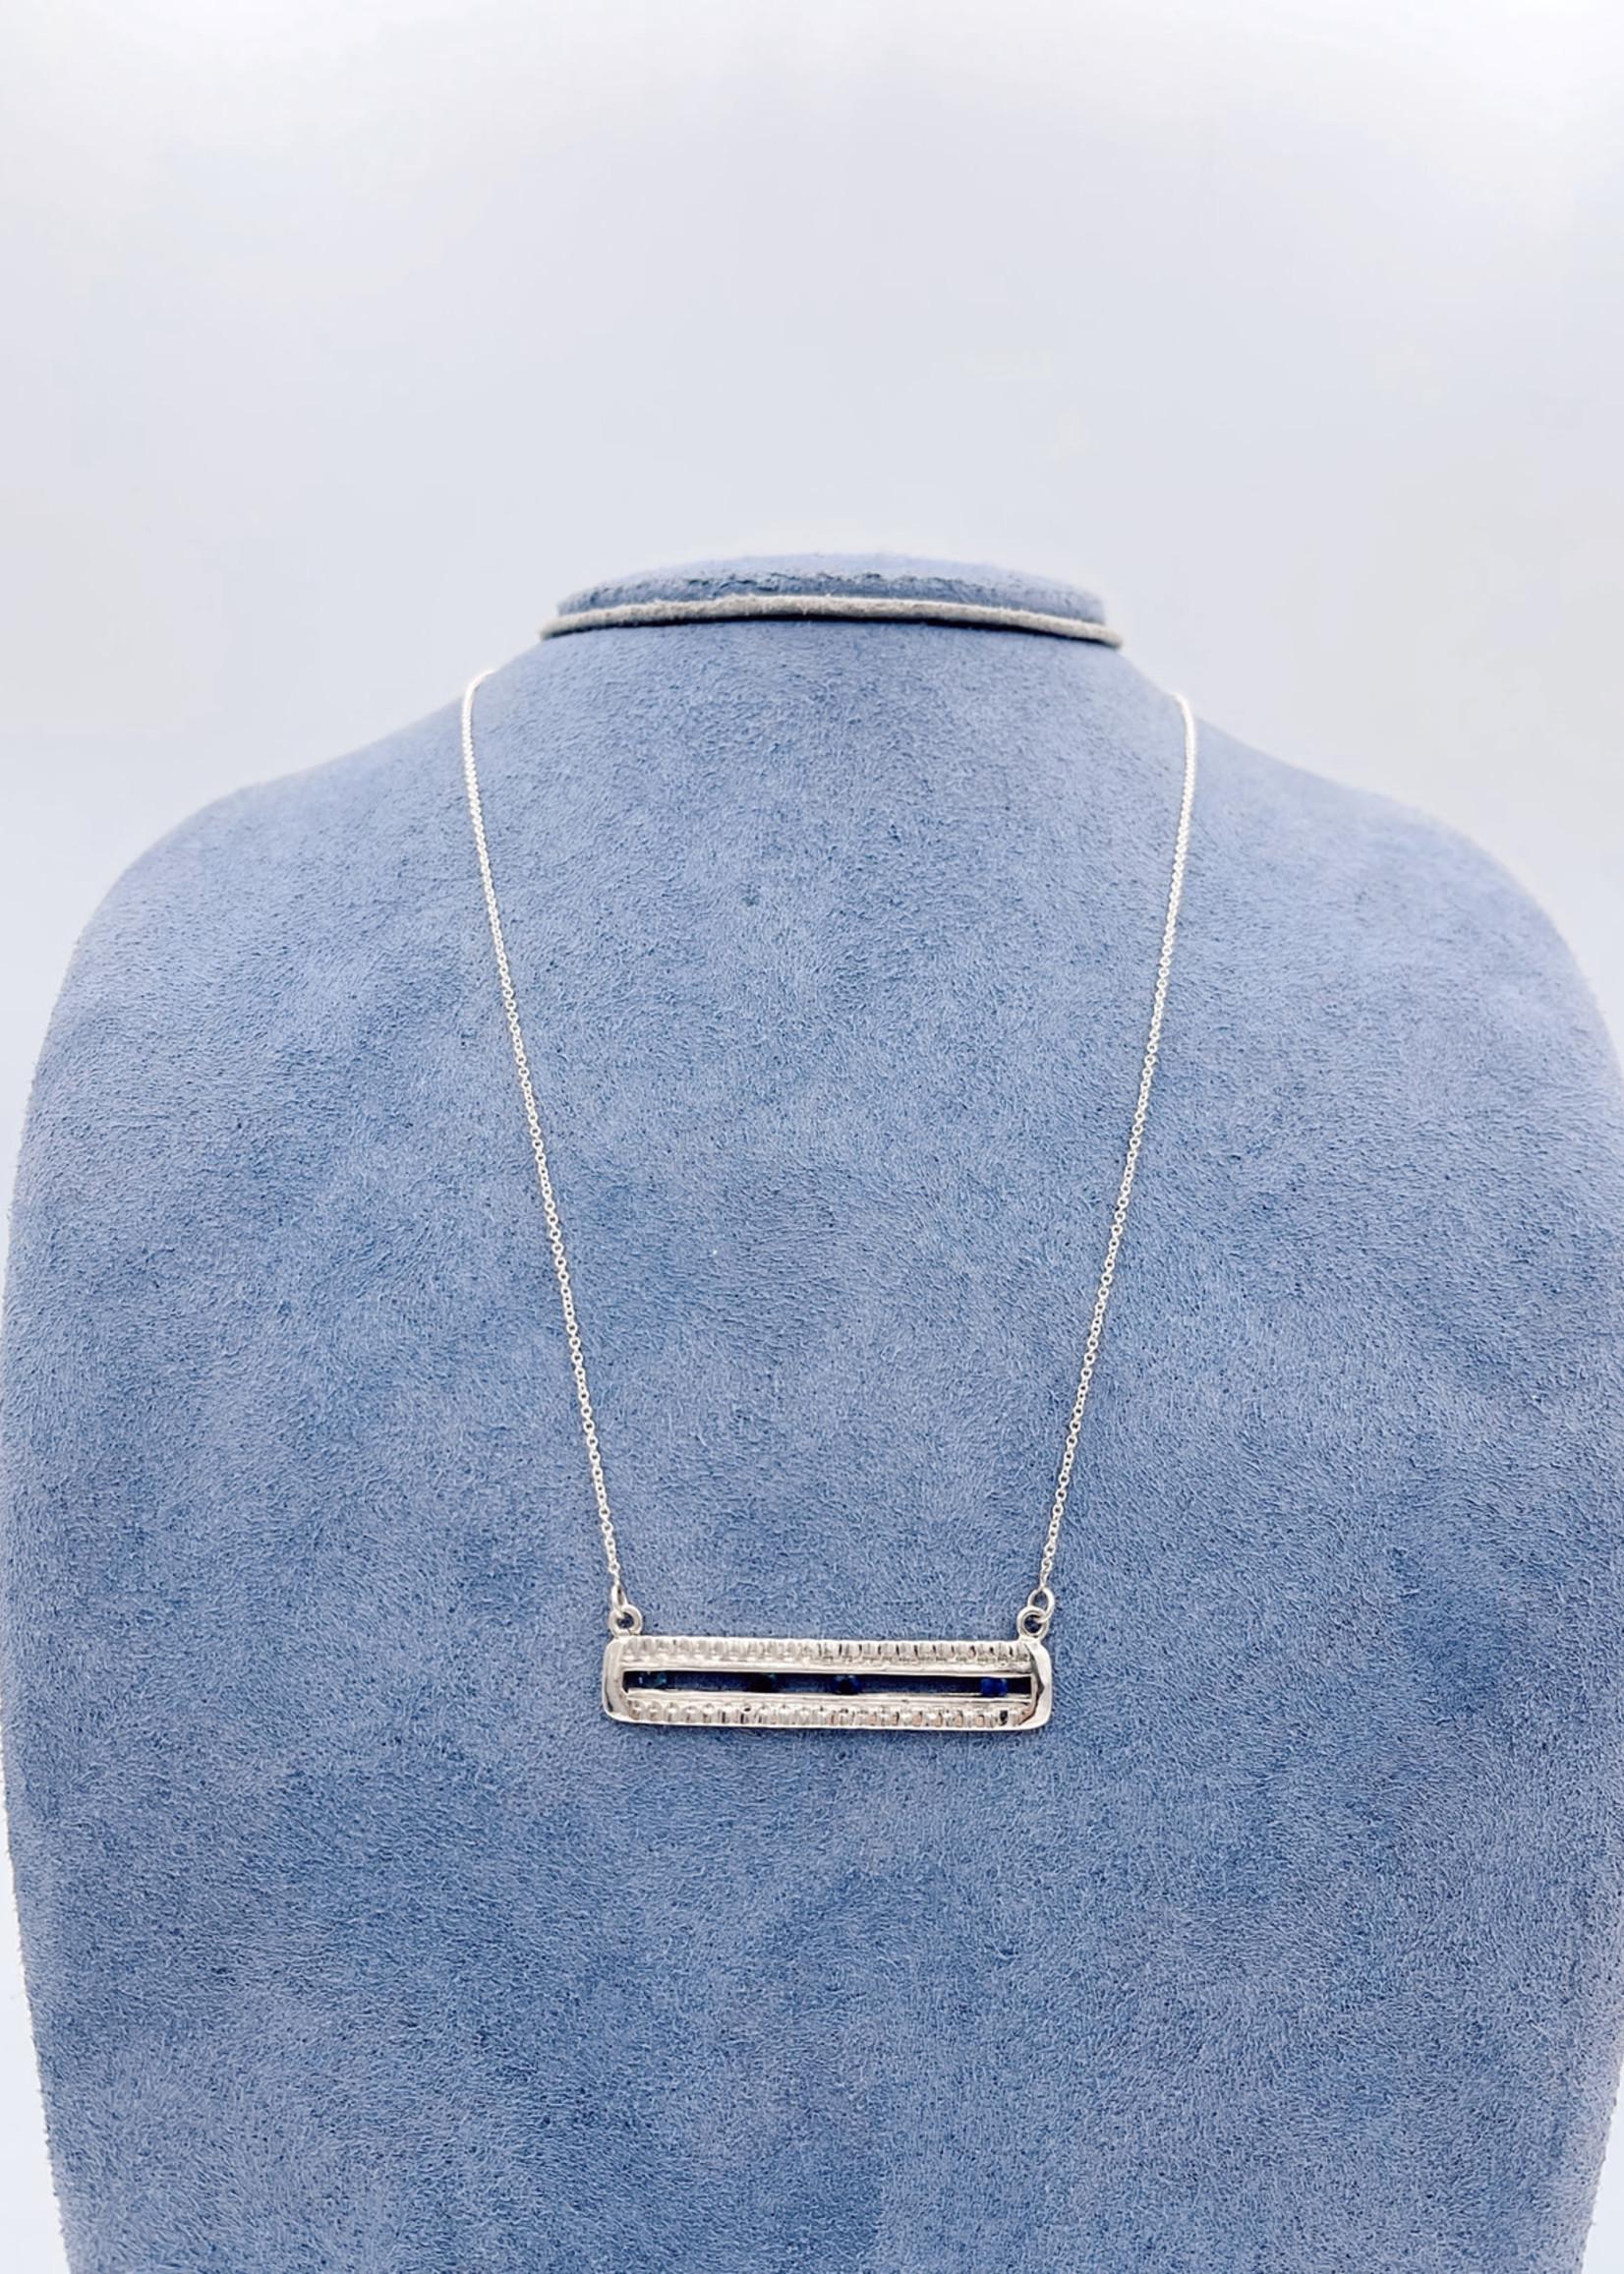 CJ Designs Sterling Silver Blue Sapphire Necklace